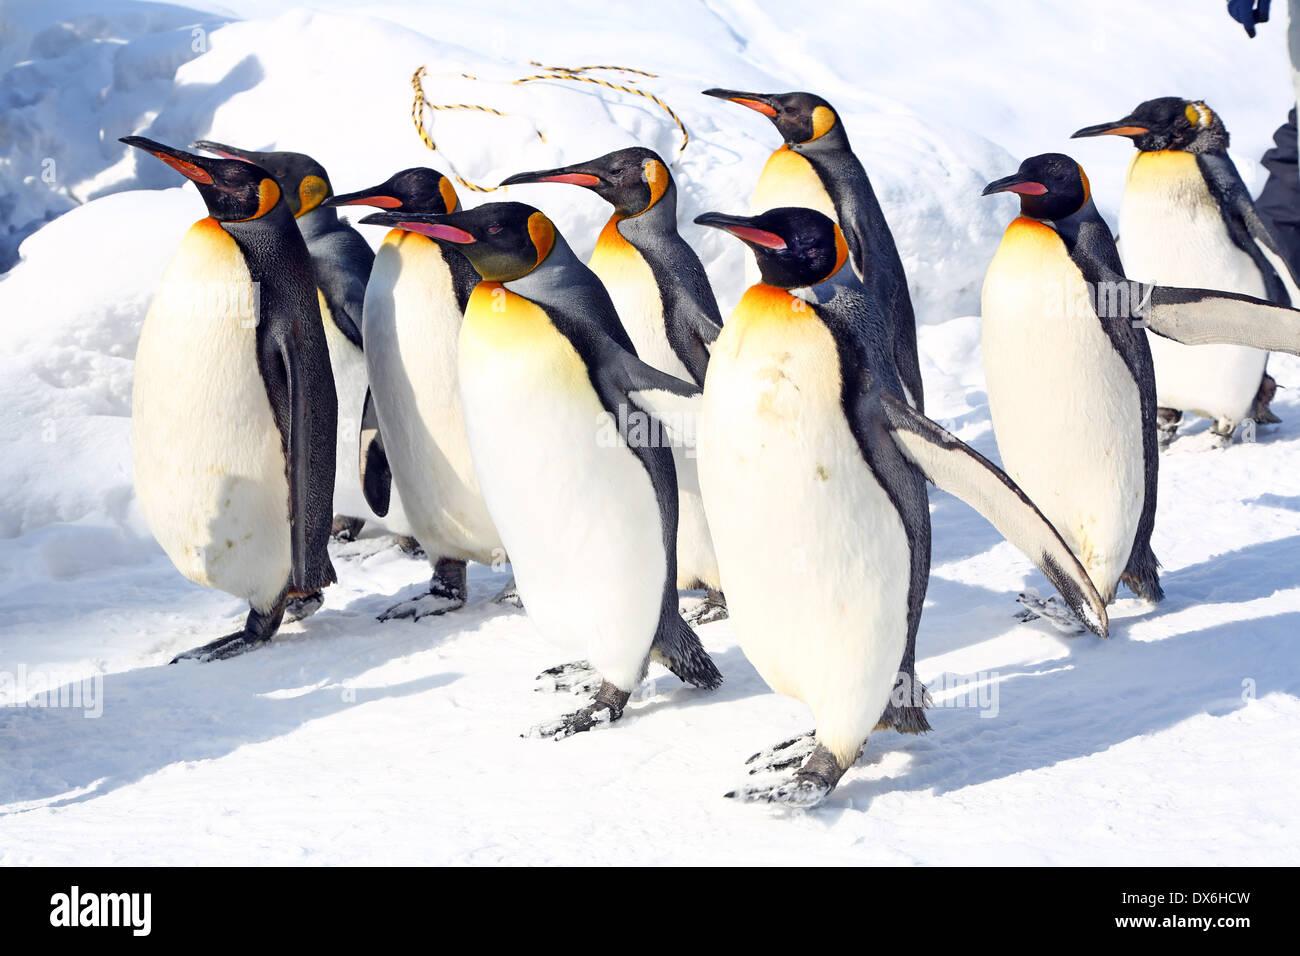 Penguin Walk at Asahiyama Zoo in Asahikawa, Japan - Stock Image